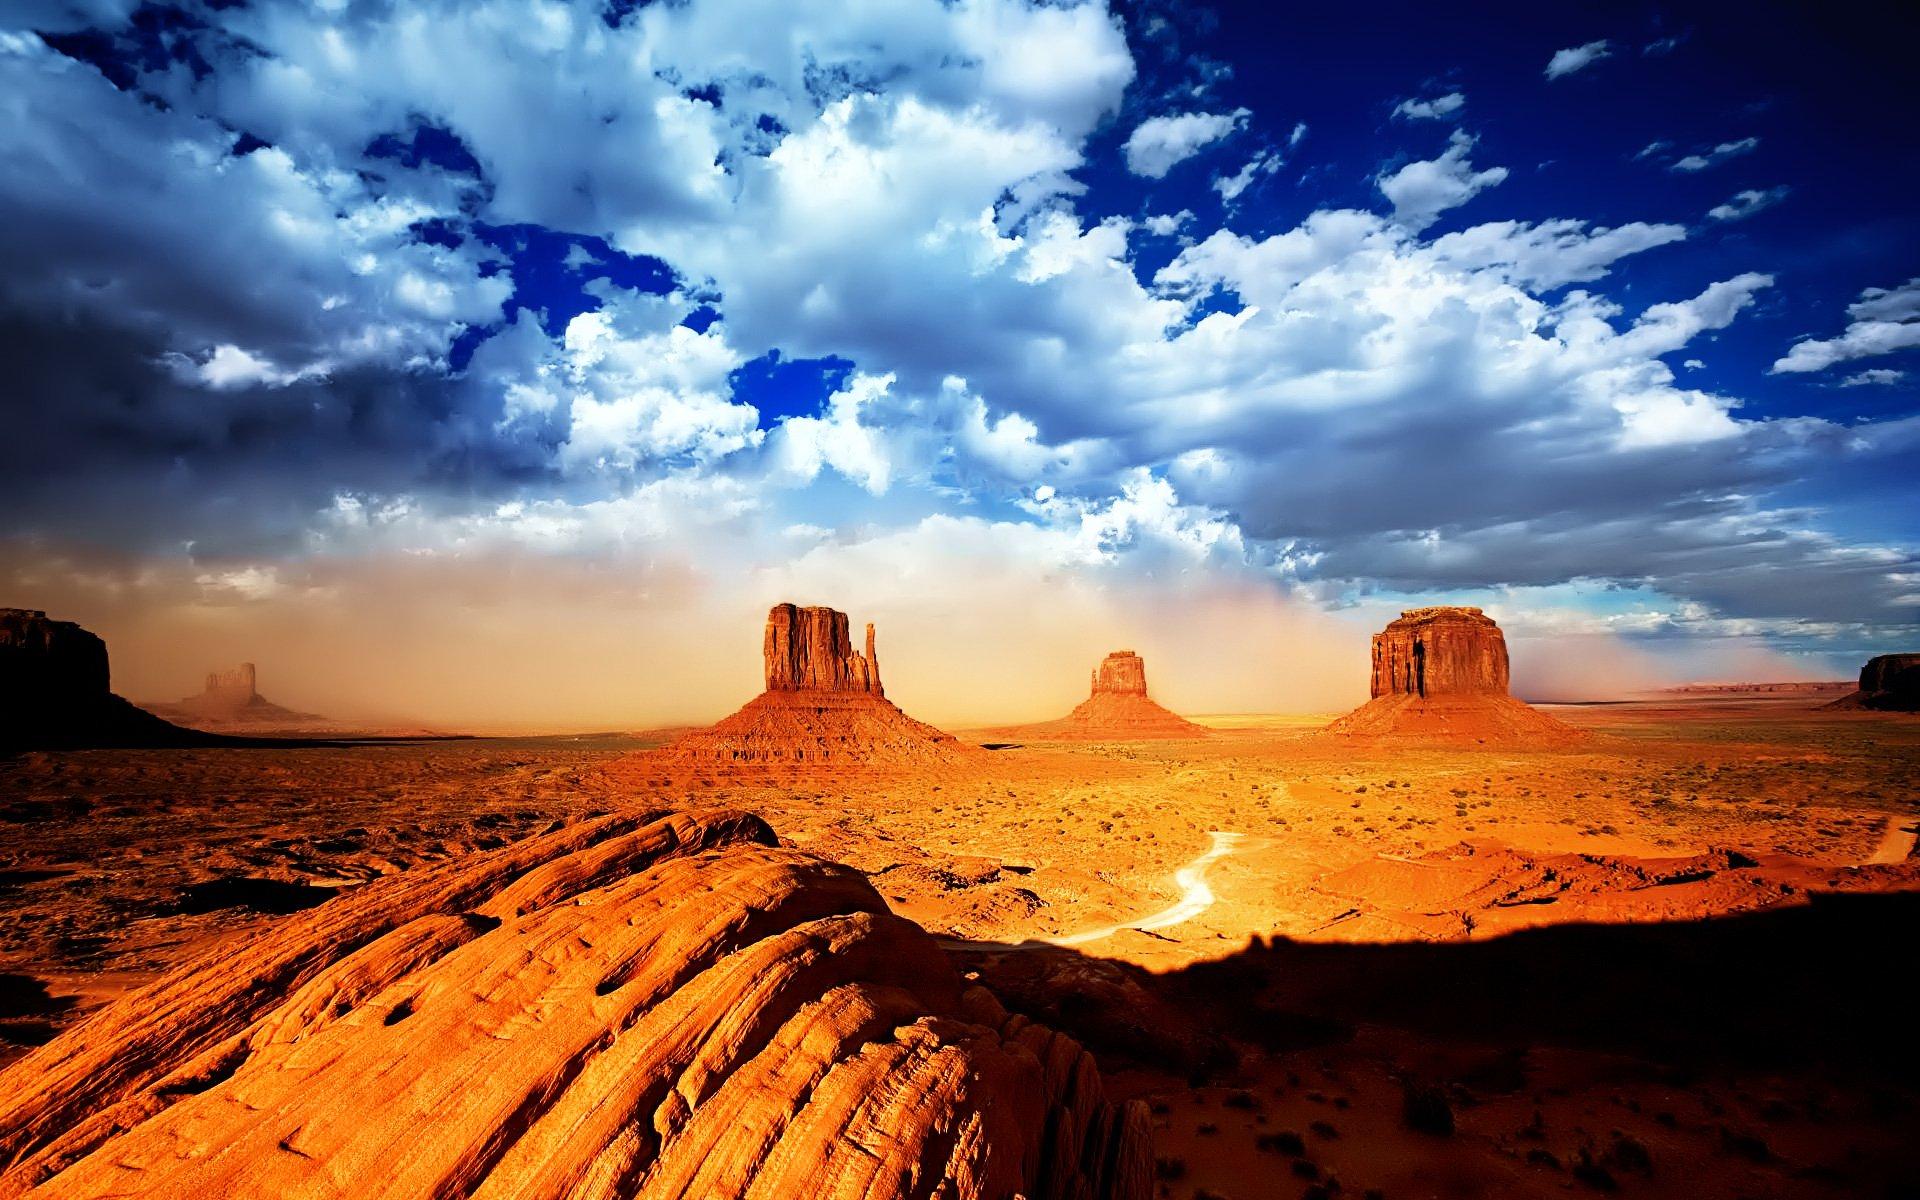 Earth - Monument Valley  Desert Rock Canyon Cloud Landscape Nature Wallpaper